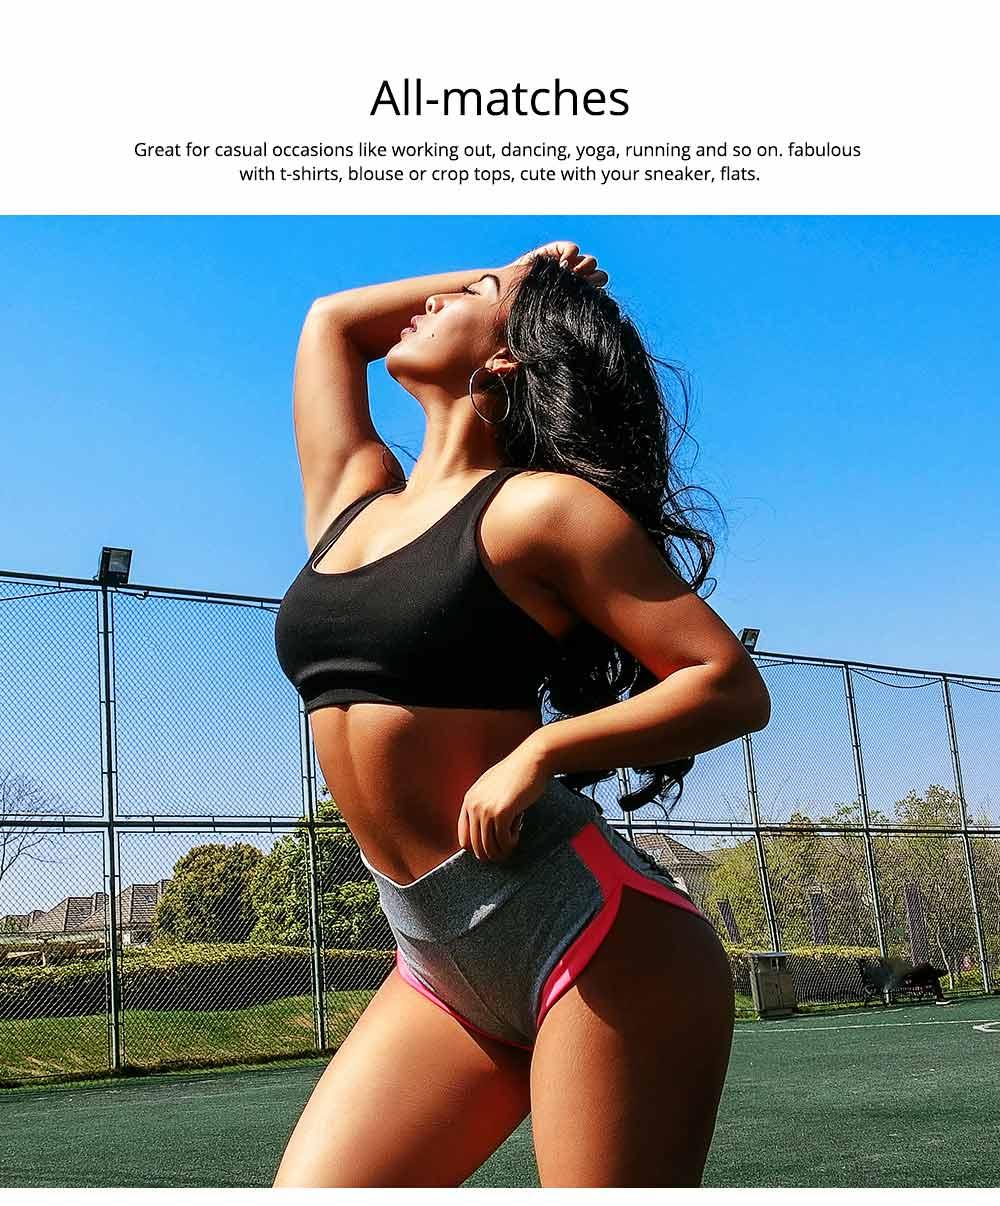 Women Workout Running Shorts Breathable Active Yoga Gym Sport Shorts Fashion Sportswear 5